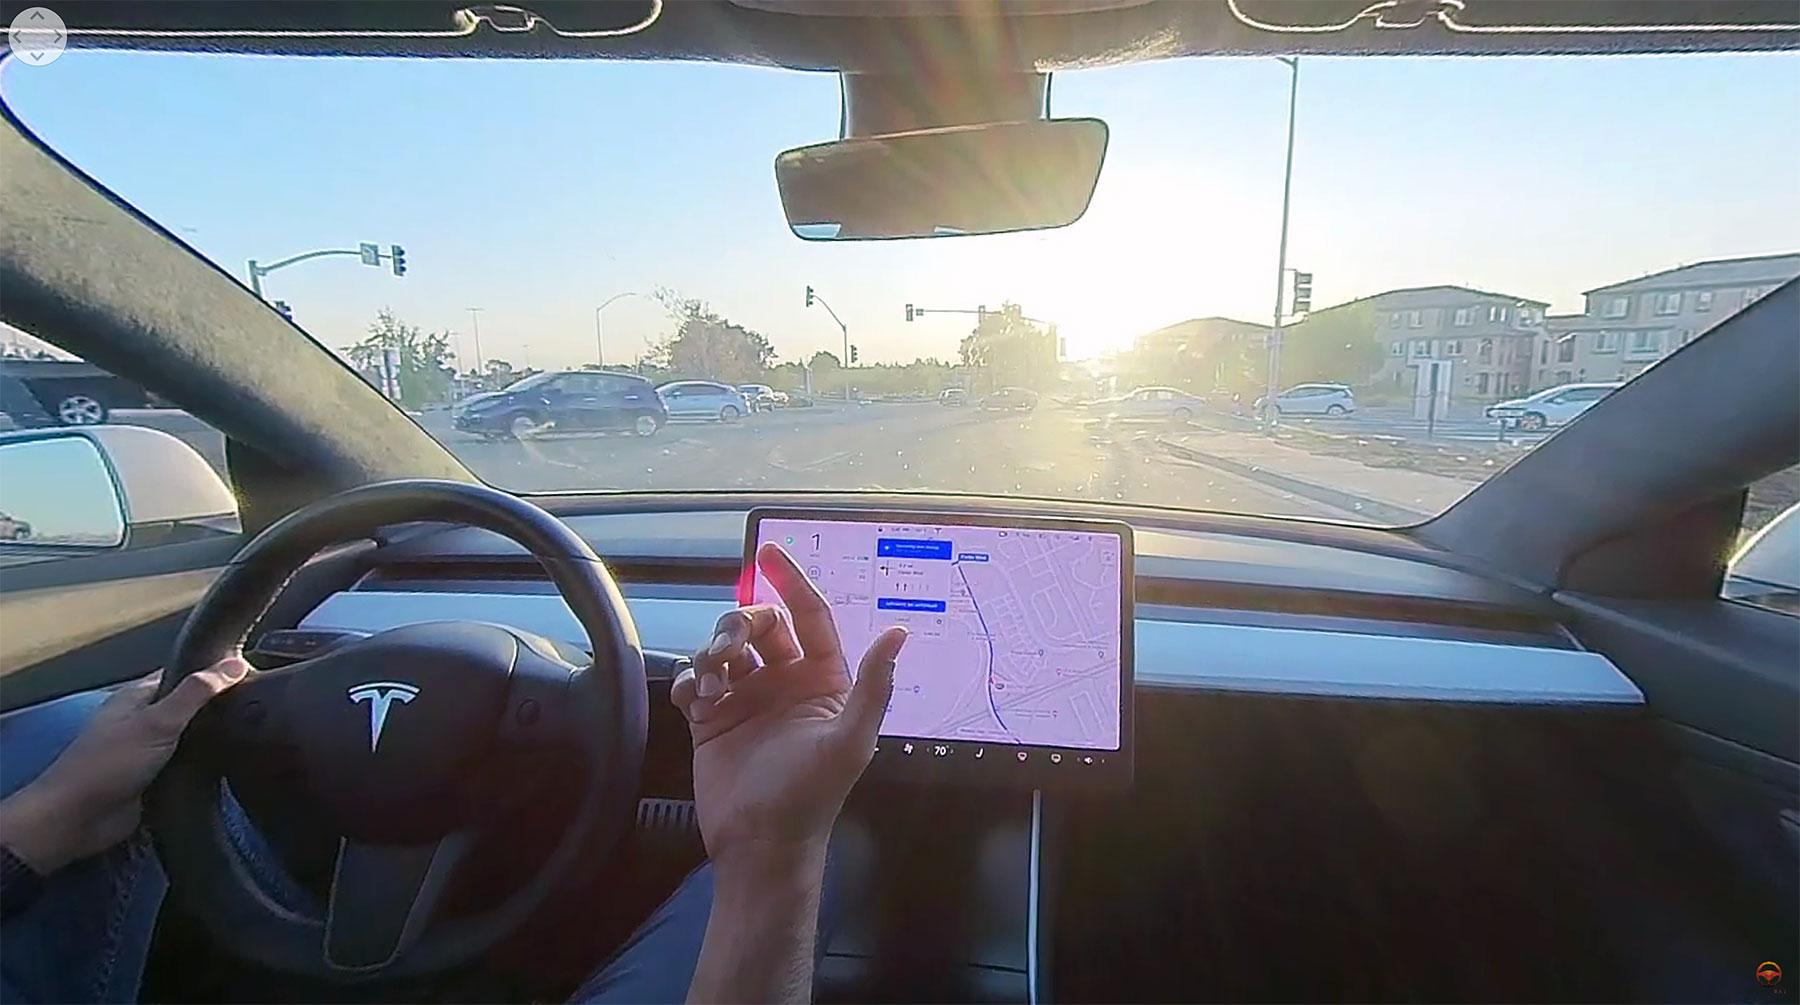 "Donnerstag Kompakt: 360°-Video mit Tesla FSD-Autopilot, Skateboard-Architektur demnächst passé, Politiker und ""Technologieoffenheit"", Tesla-Rückruf in China"